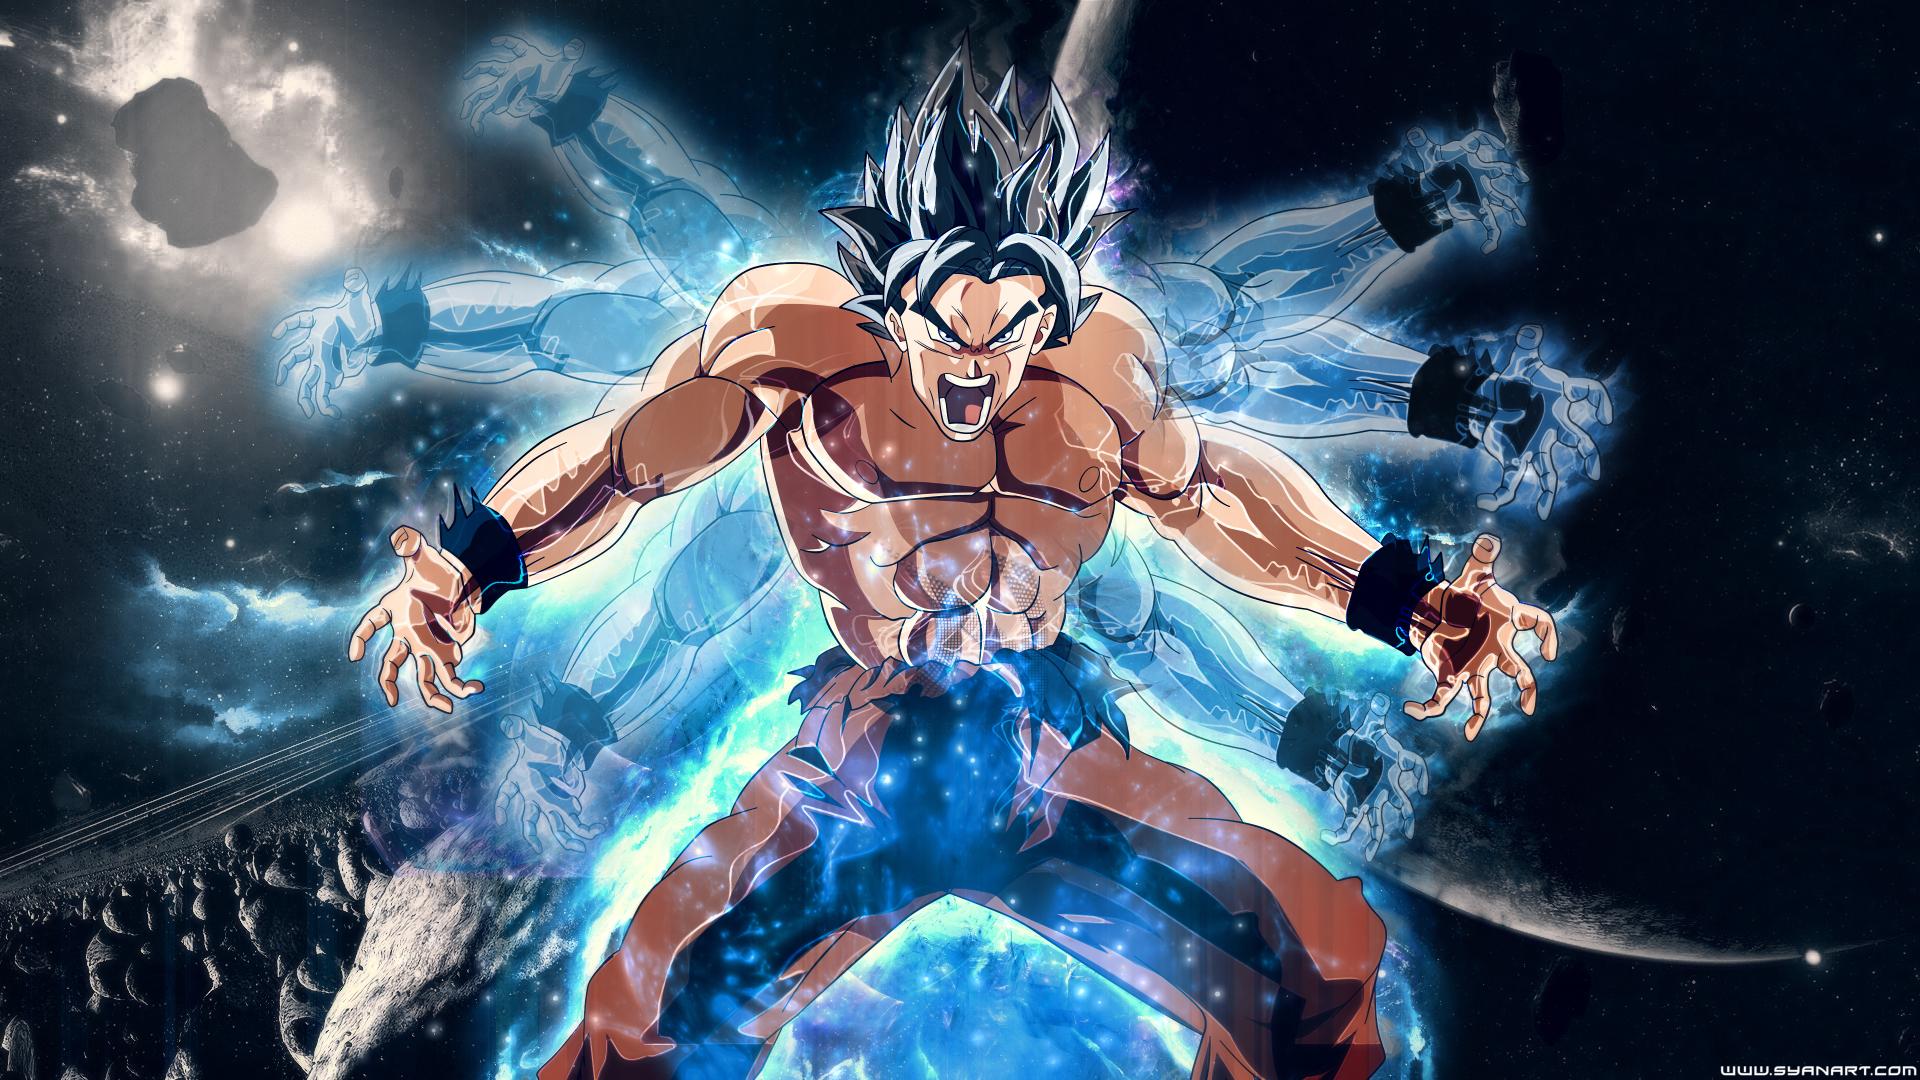 Dragon Ball Super Hd Wallpaper: Dragon Ball Super Goku Angry, HD 4K Wallpaper